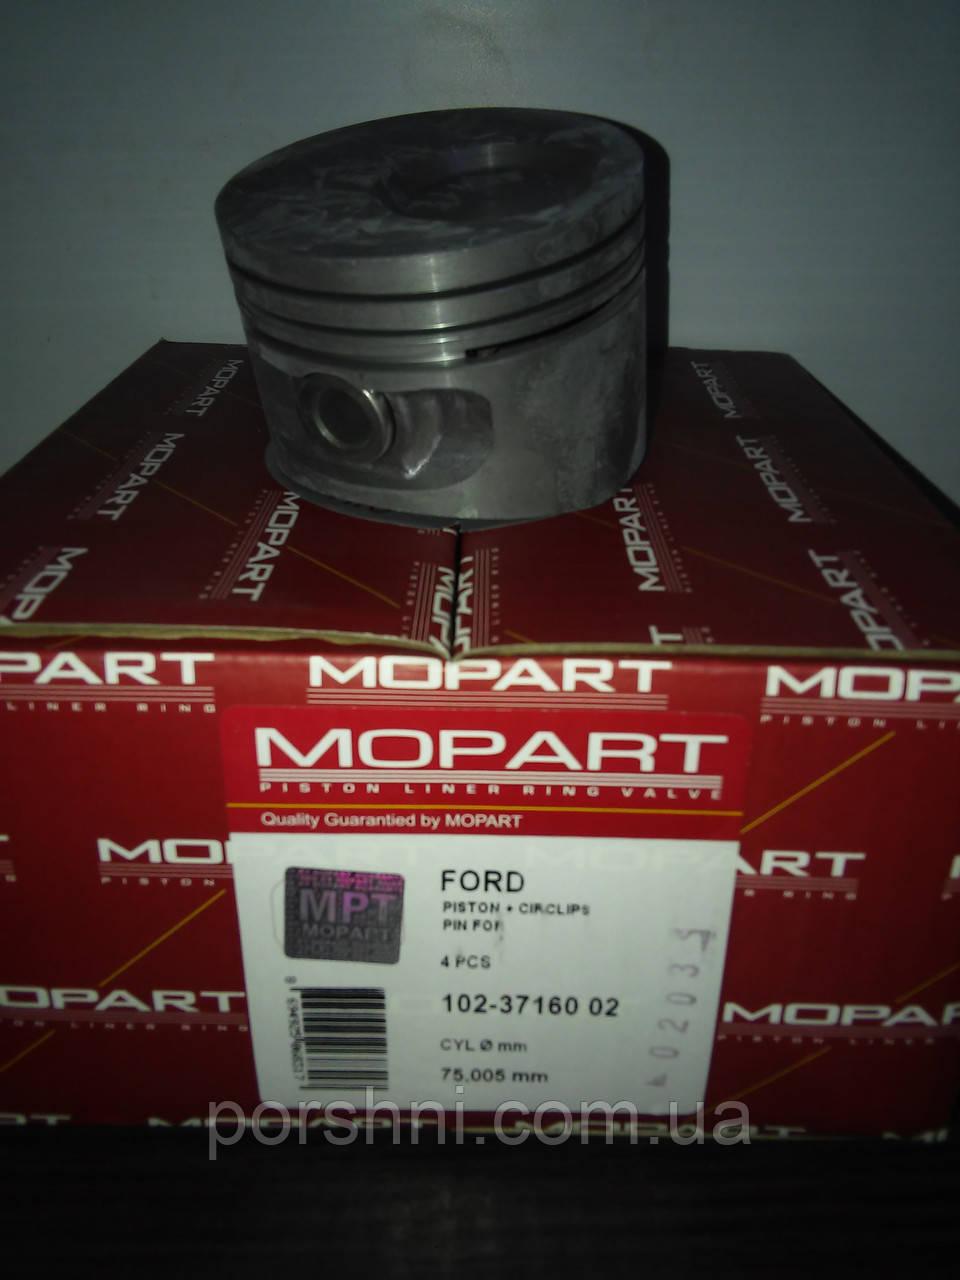 Поршнева 73,94 + 0.50 Ford Escort 1,3 OHV 89 -- м. інж Mopart 371601 без кол